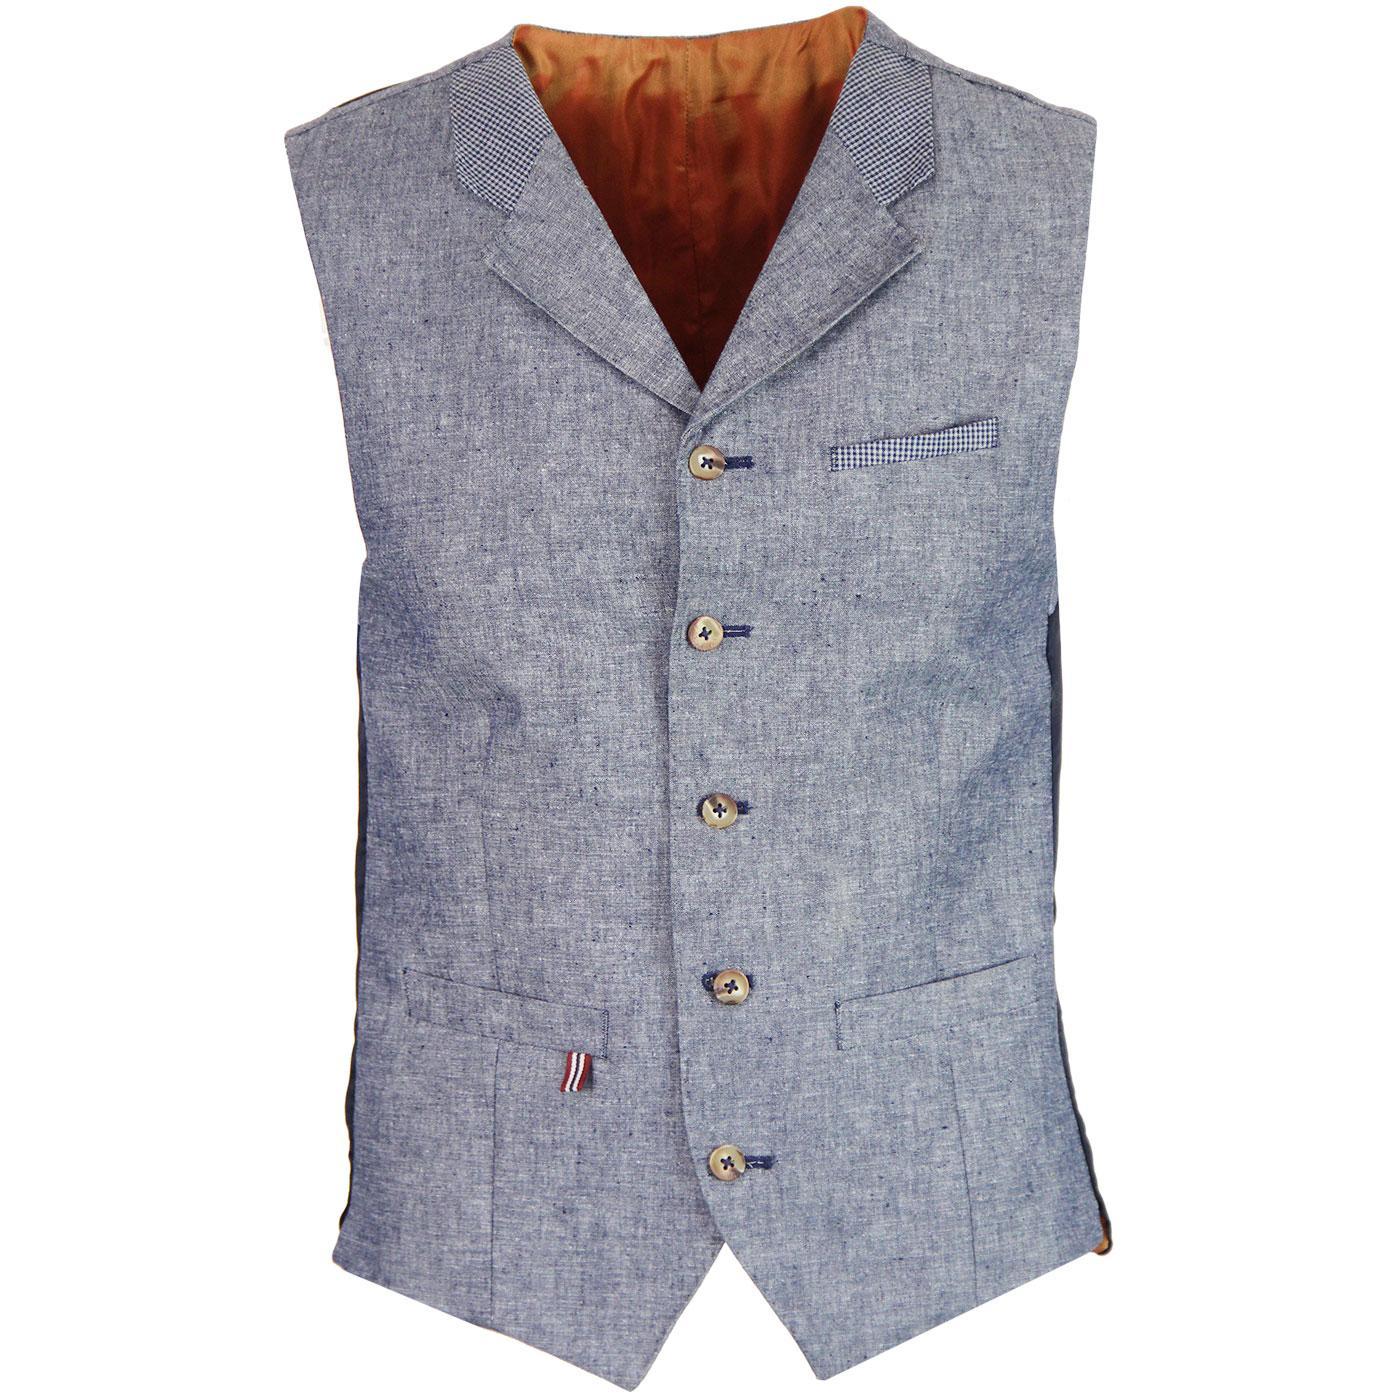 Tyburn GIBSON LONDON Mod 60s Mod Linen Waistcoat